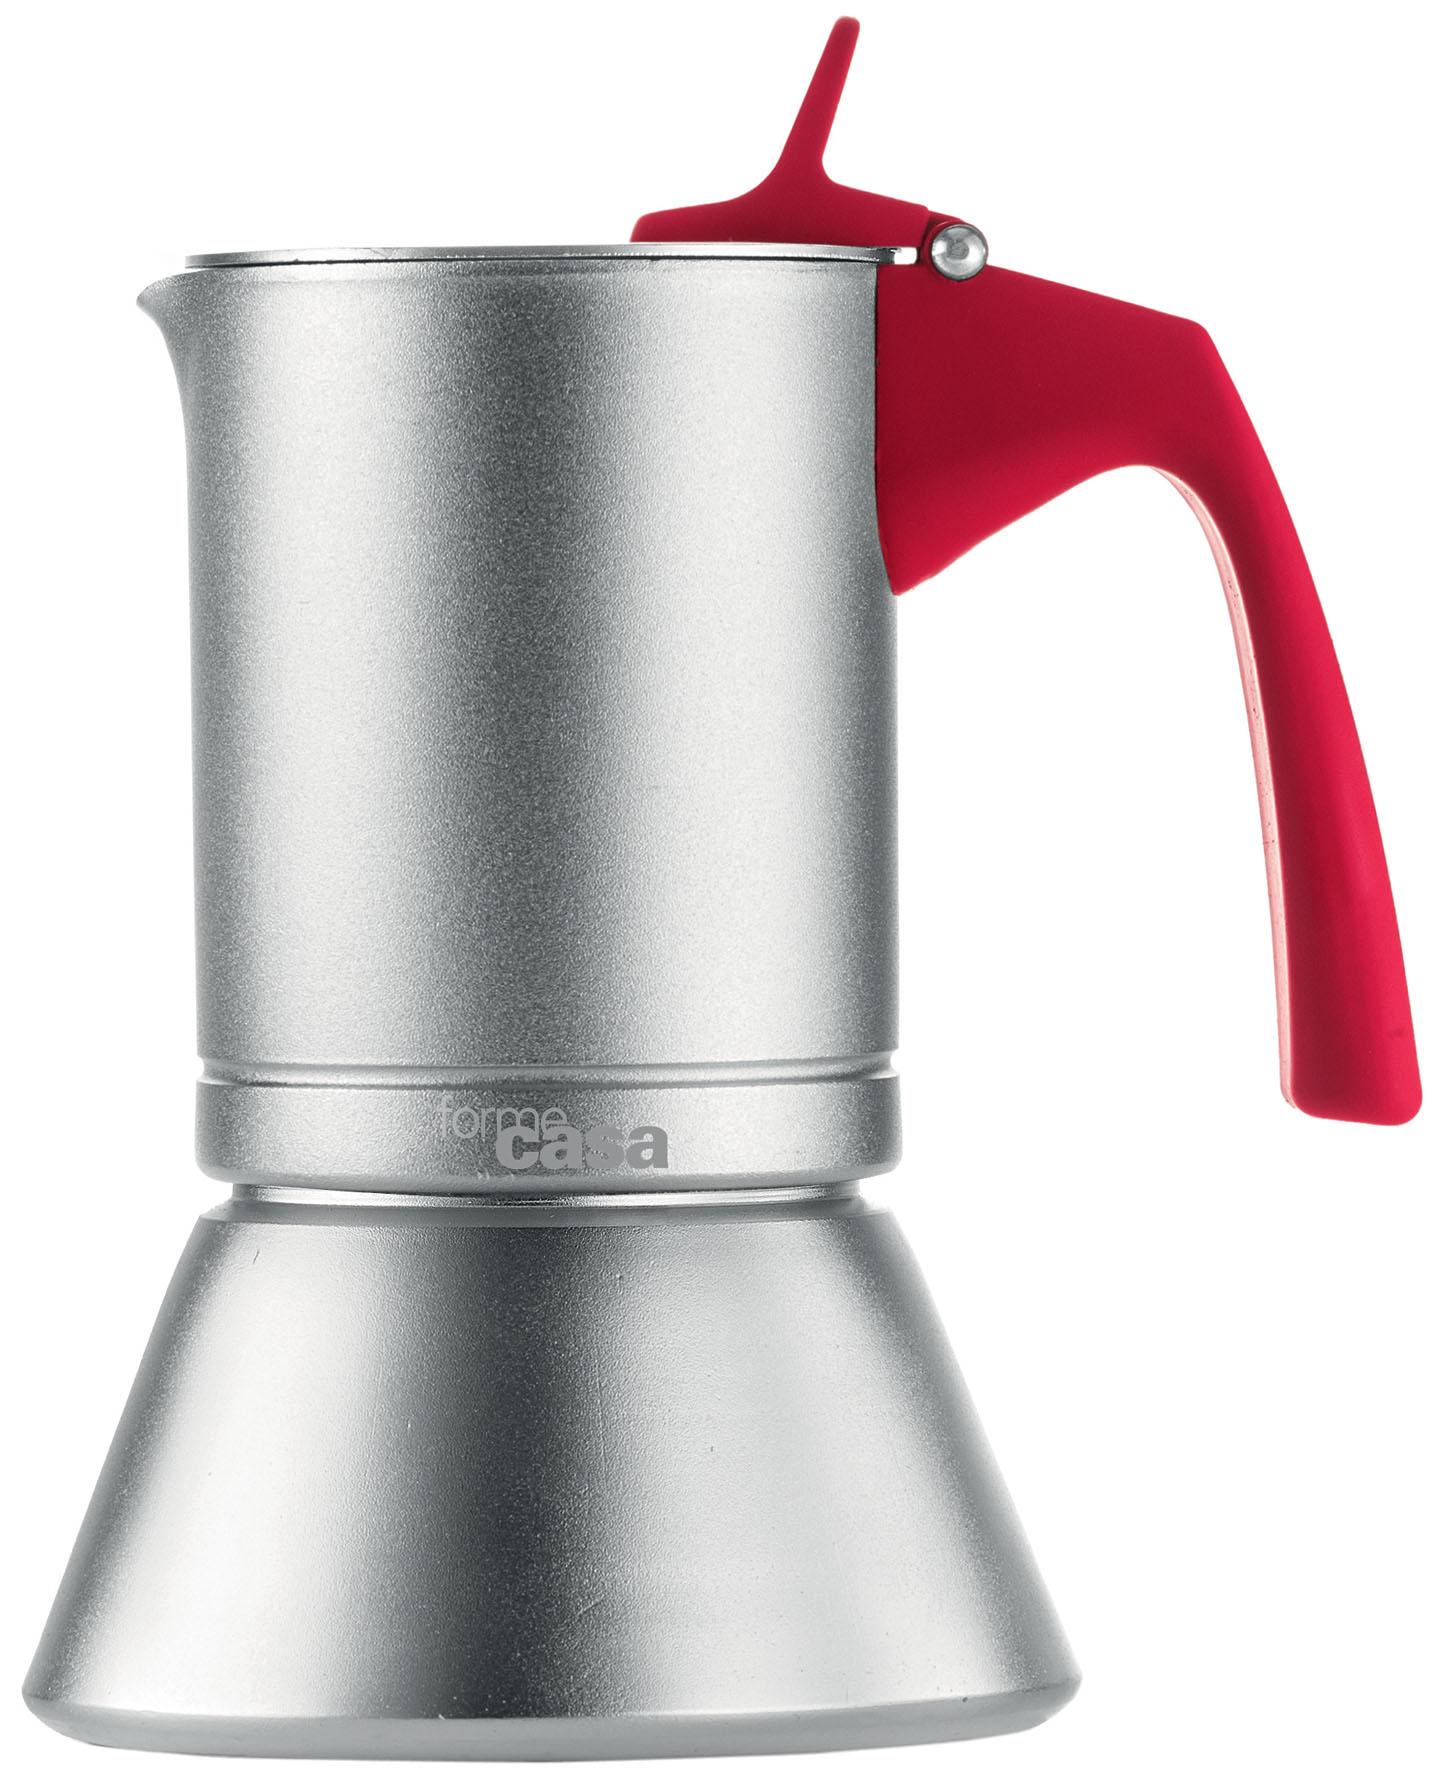 CAFFETT TZ 3 INDUZ AROMA M RSO